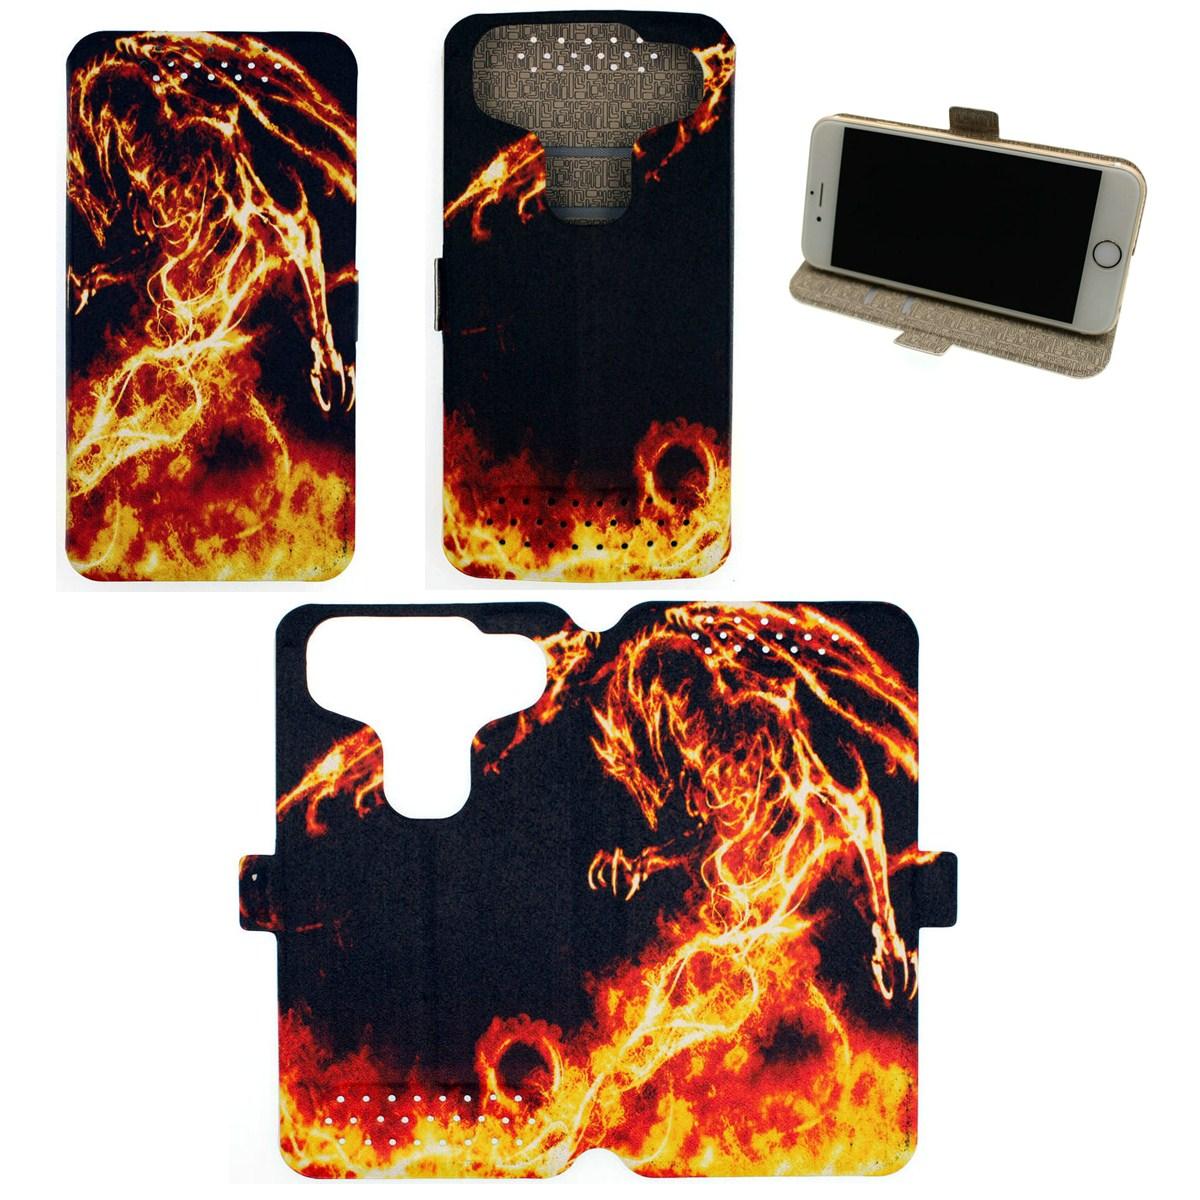 Universal Phone Cover Case for Rim Blackberry Z3 Stj100-2 Case Custom images PHL(China (Mainland))